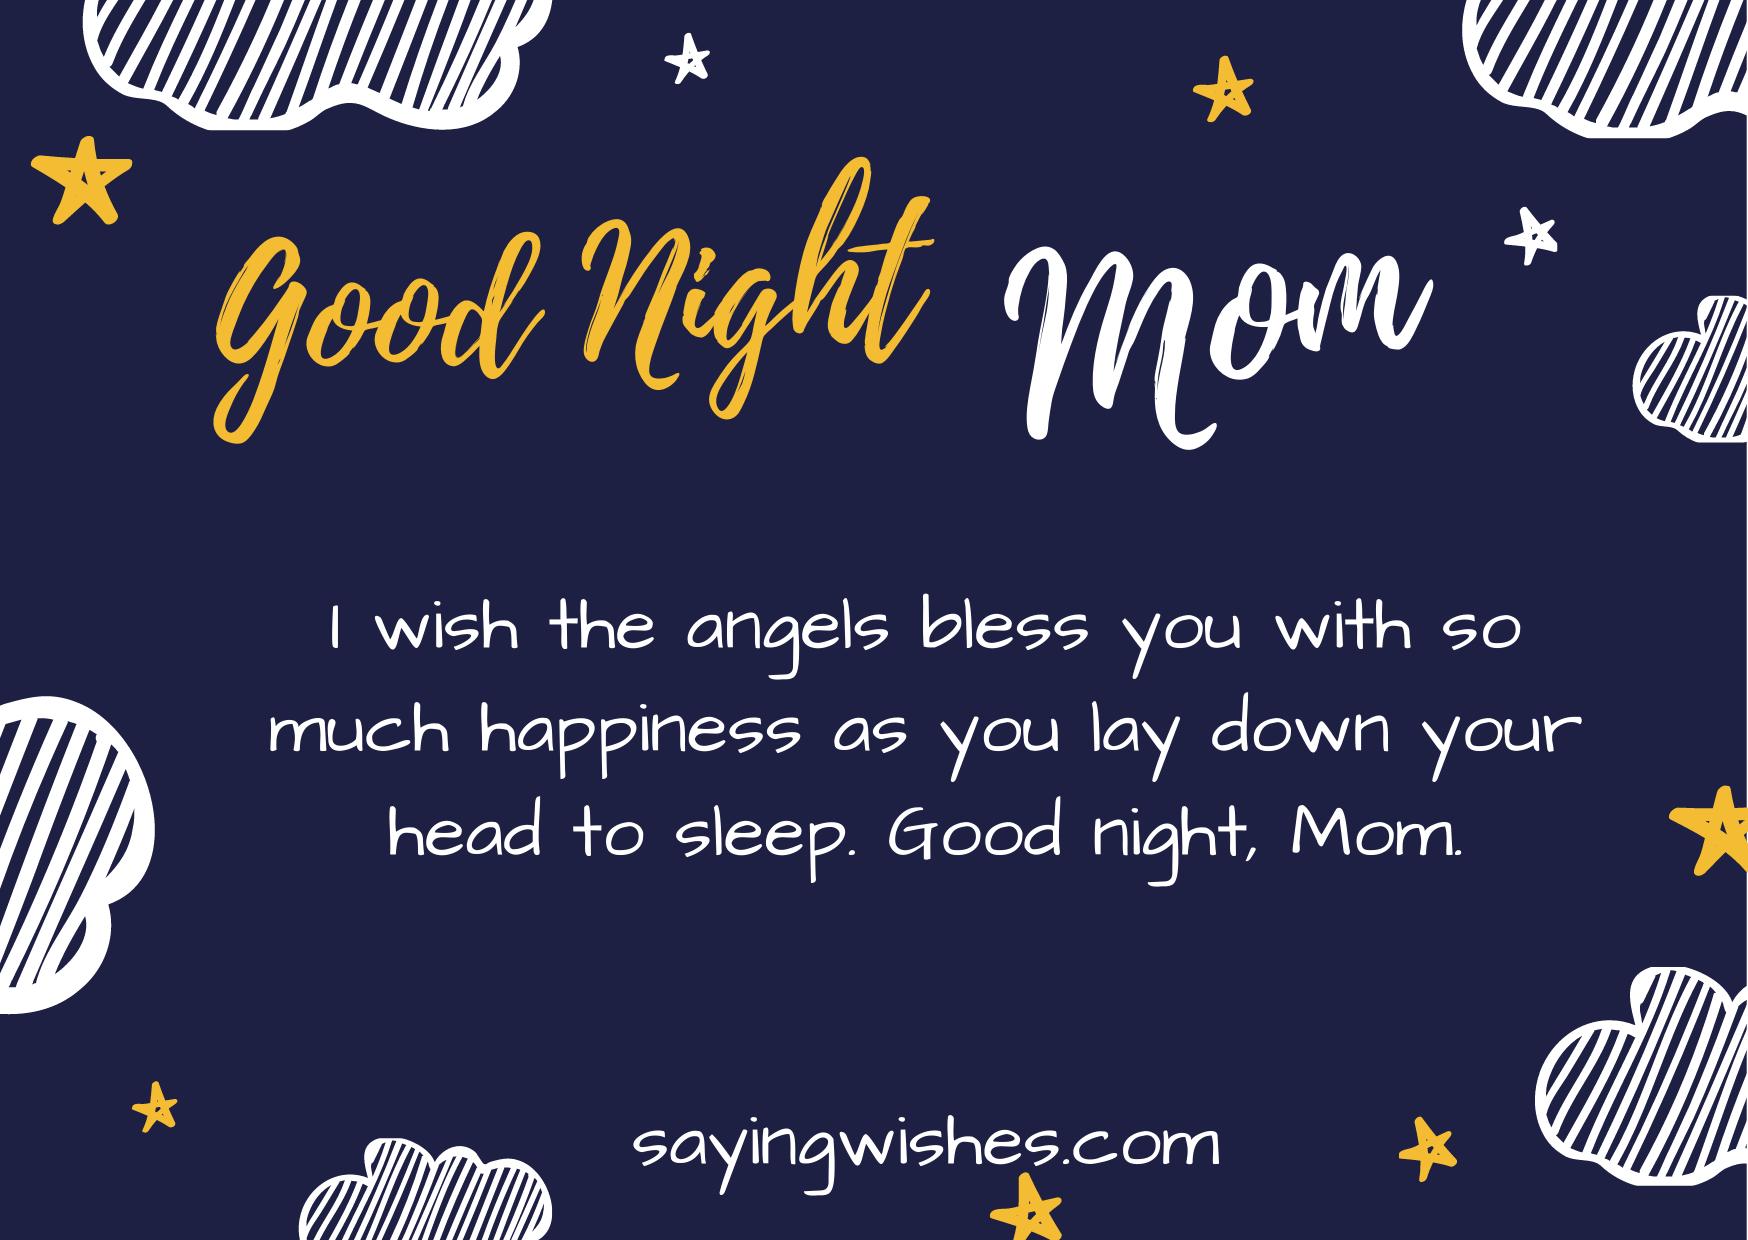 good night whatsapp status for mom